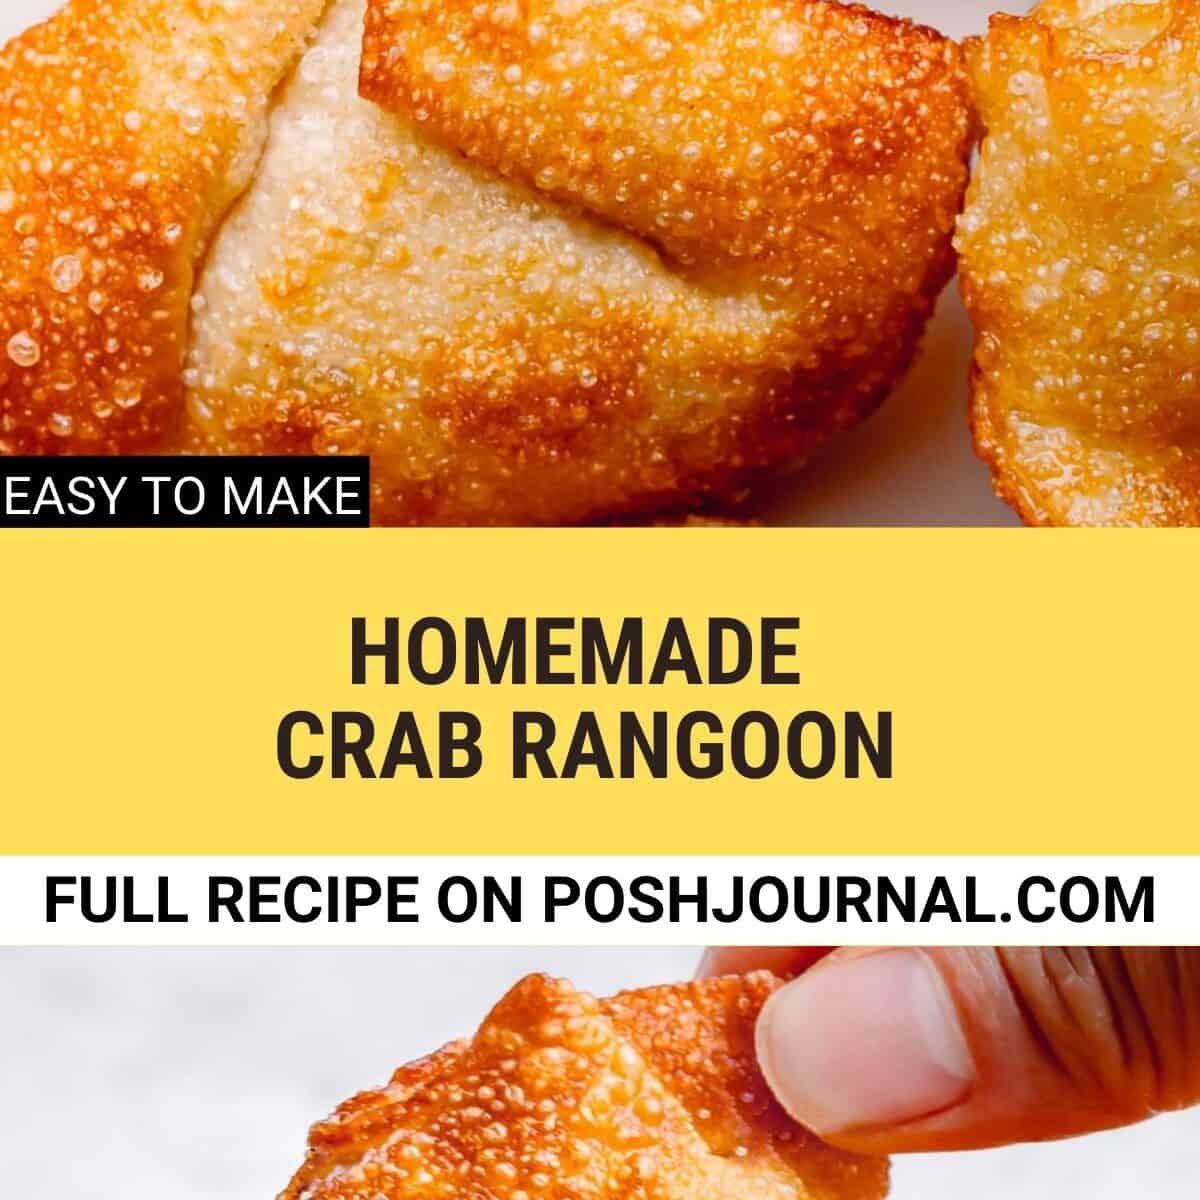 Homemade Crab Rangoon